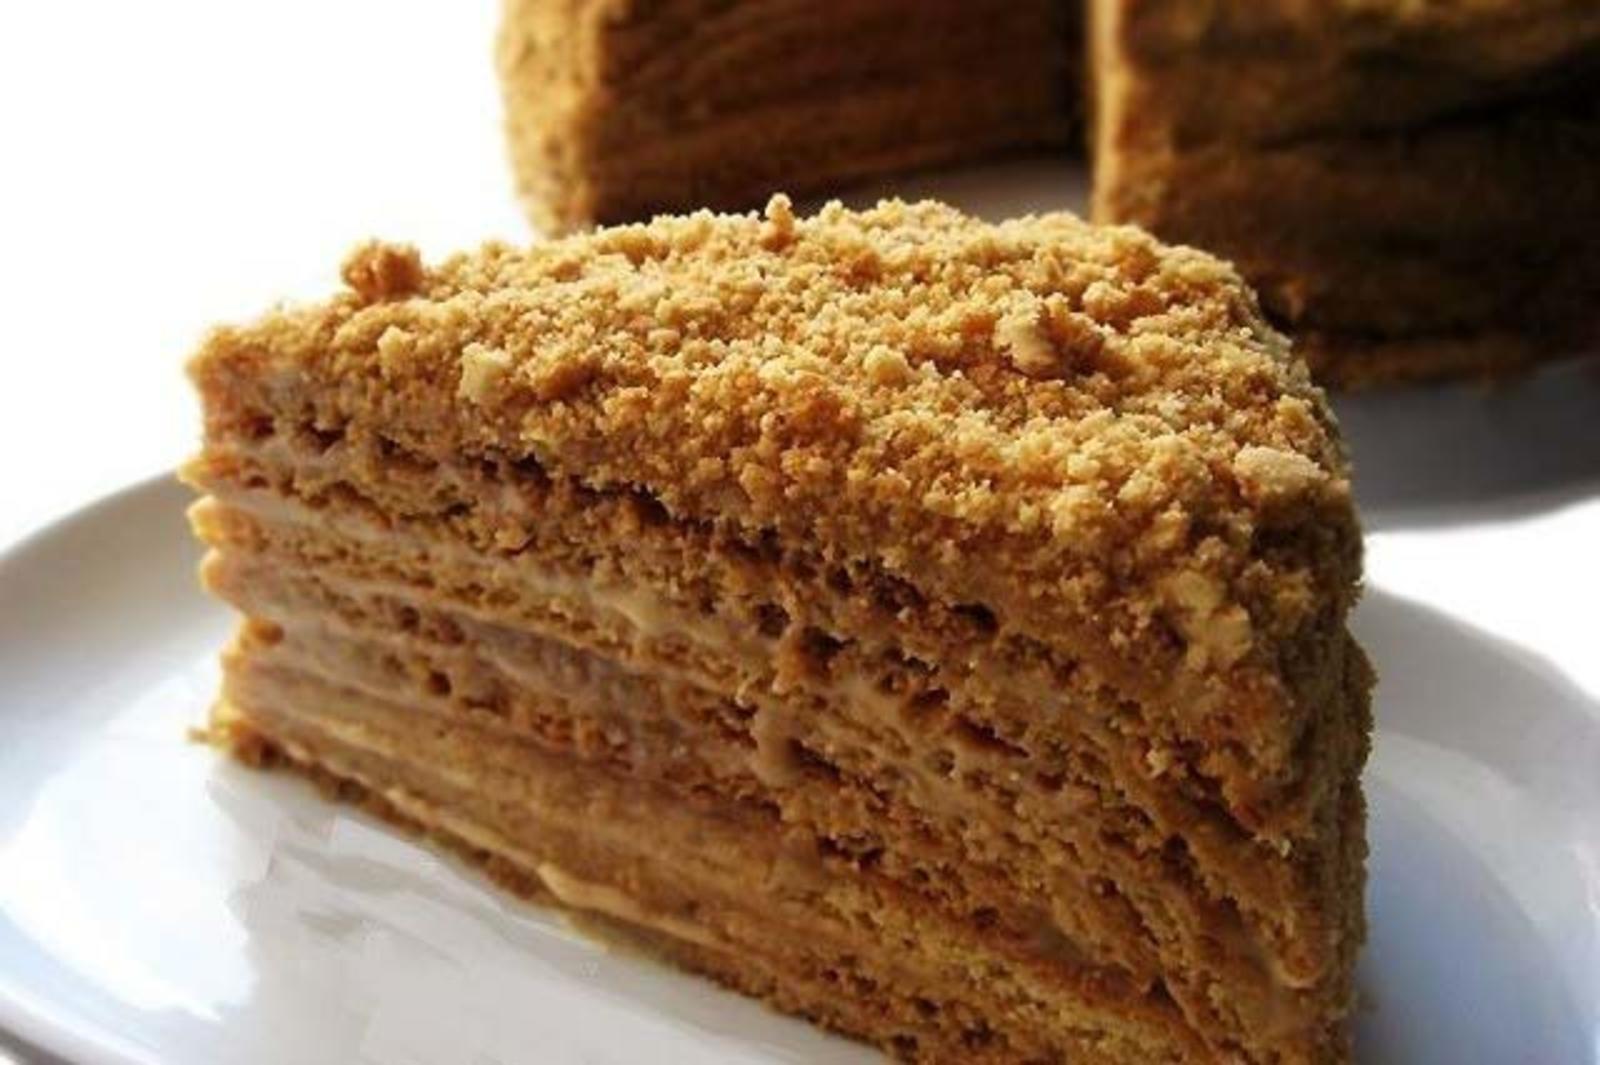 торт каприз рецепт с фото пошагово вот